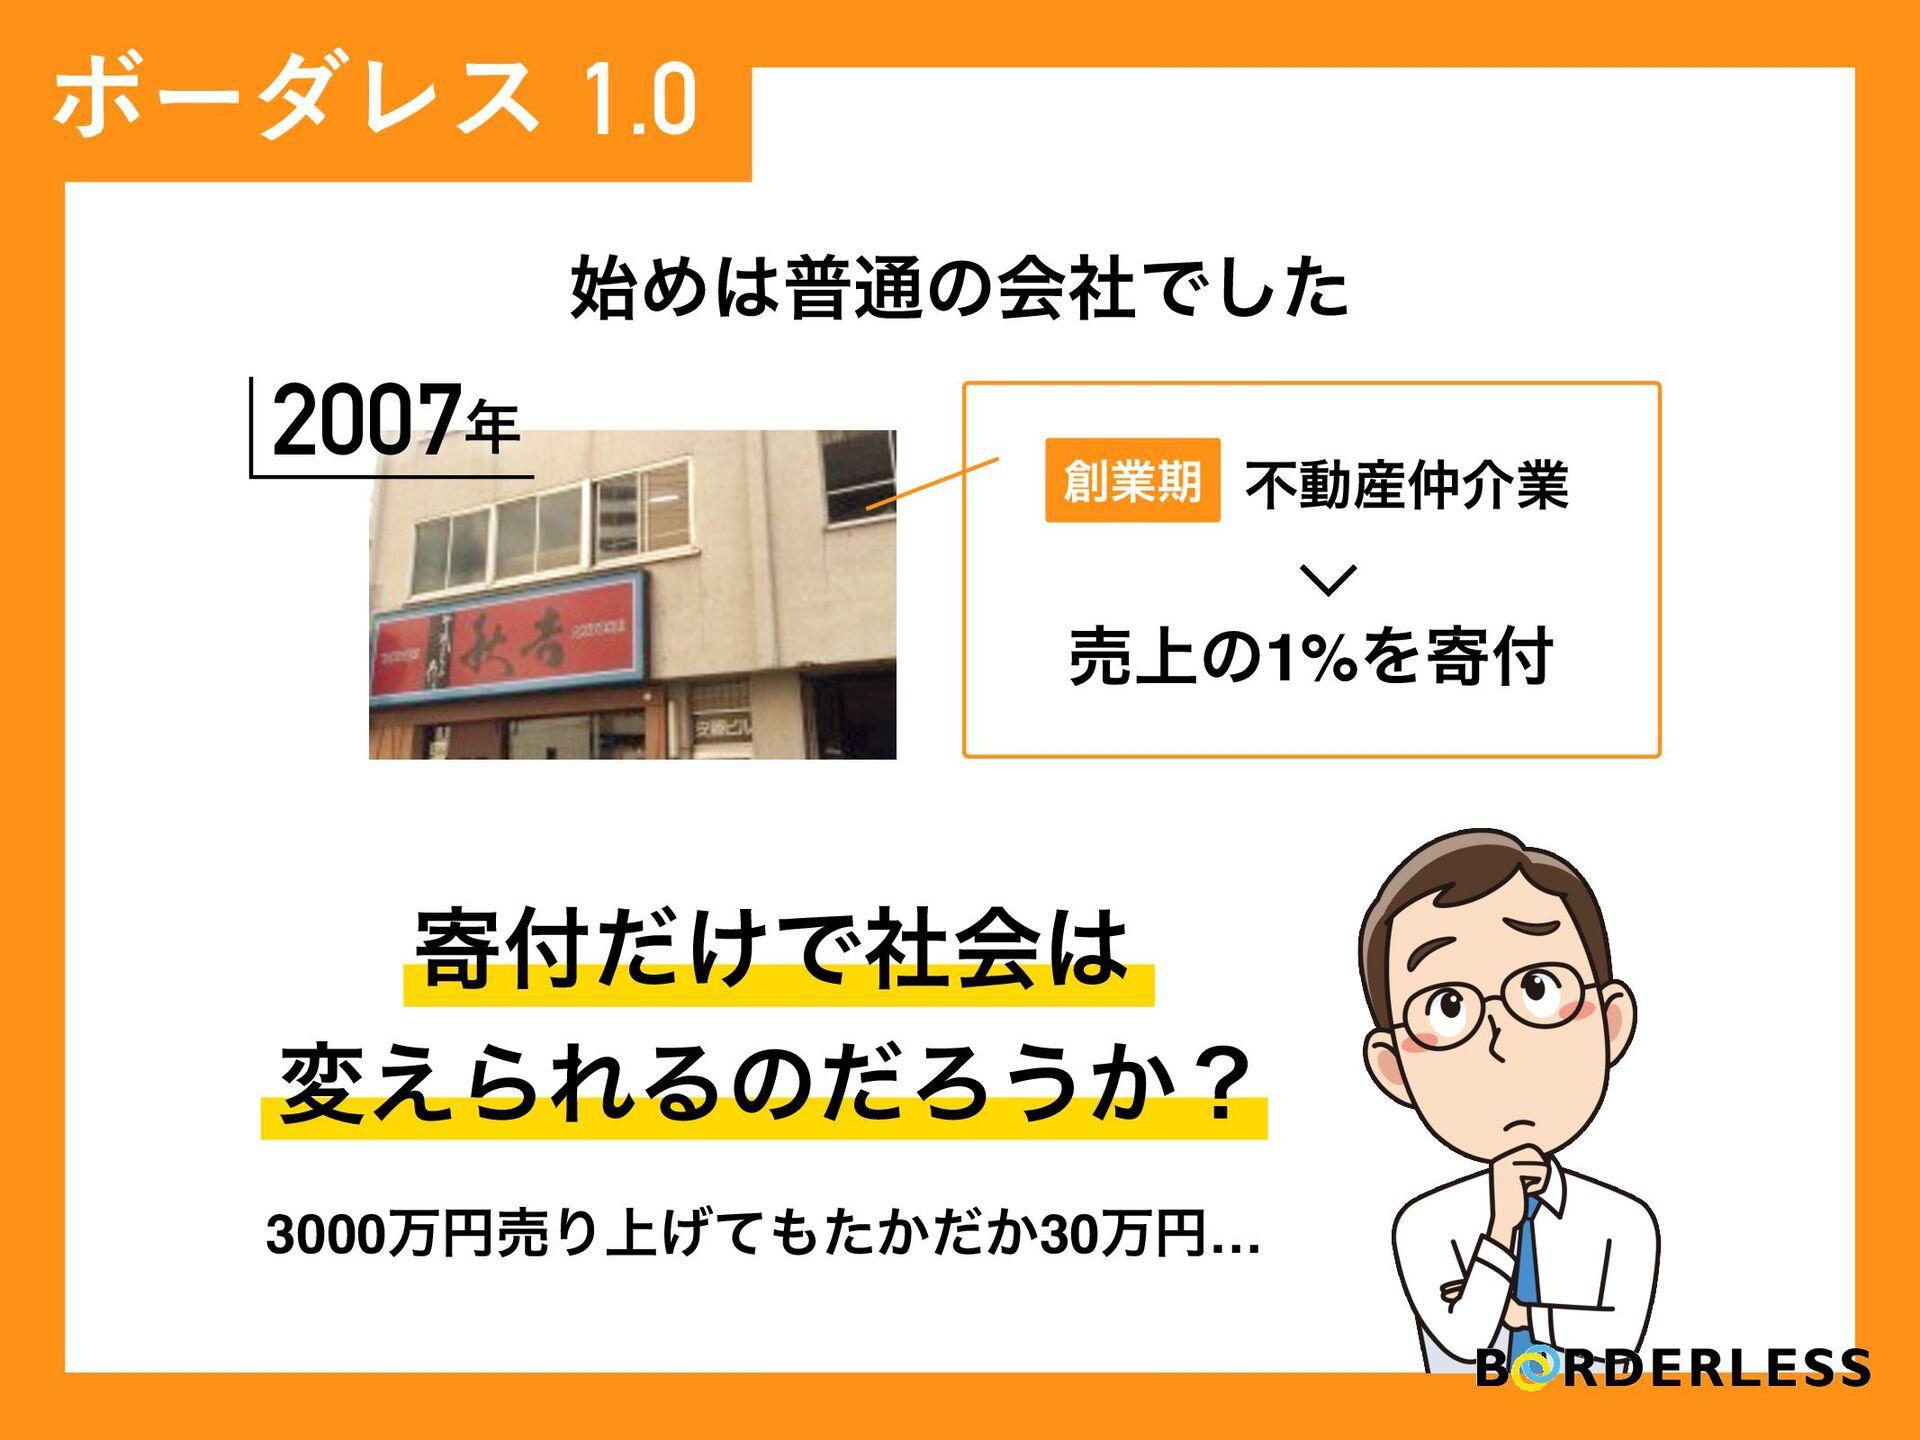 N Ίී௨ͷձࣾͰͨ͠ ϘʔμϨε1.0 2007 د͚ͩͰࣾձ ม͑ΒΕΔͷͩΖ...